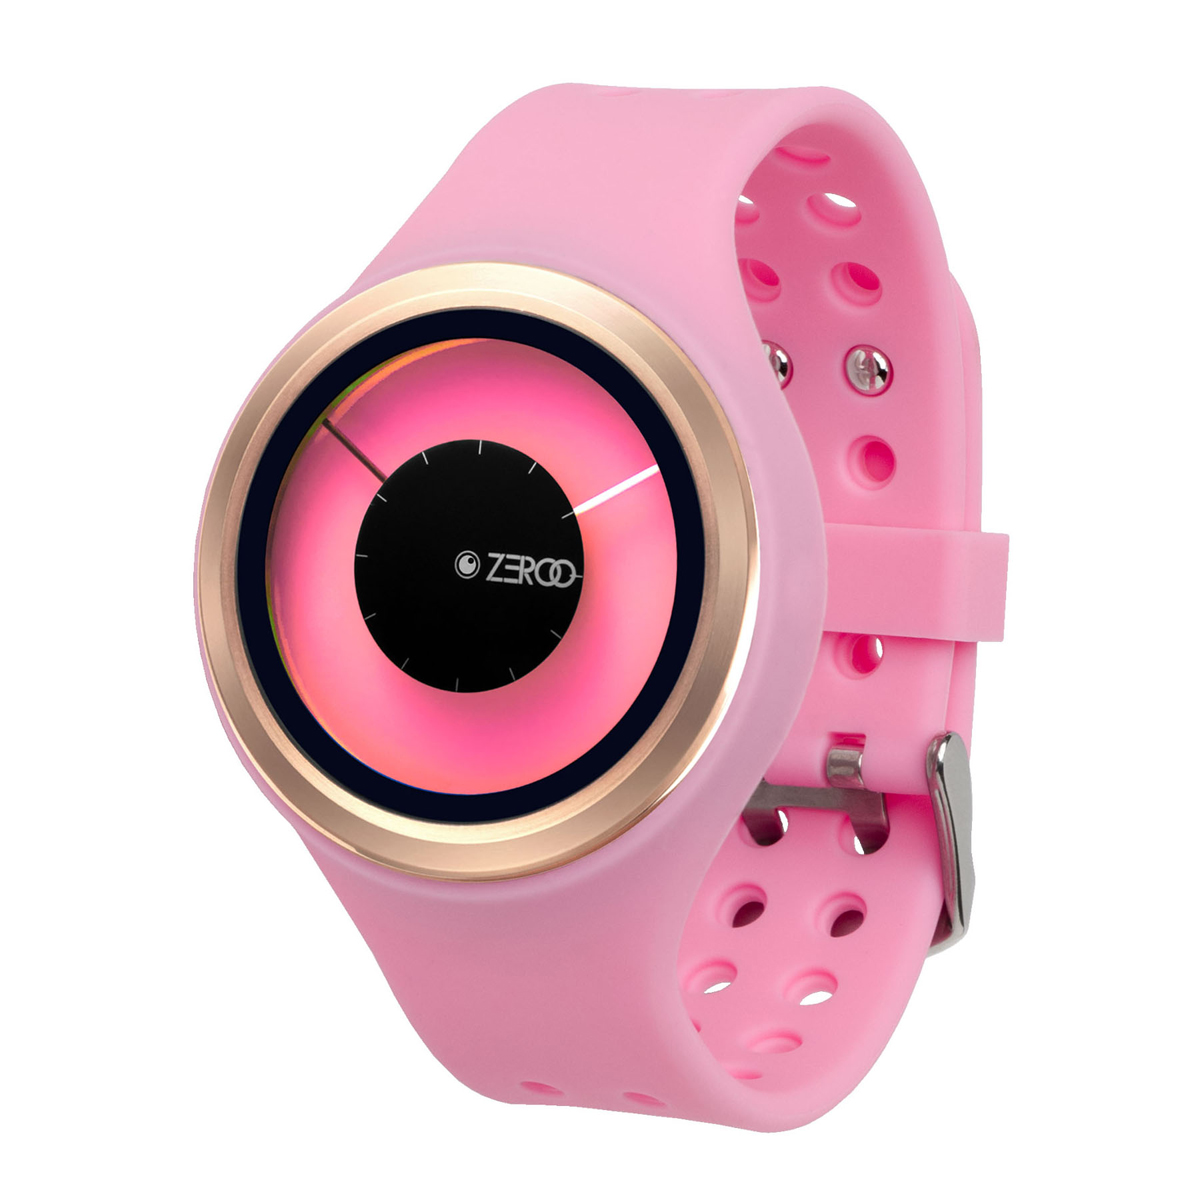 ZEROO MAGIA AURORA ゼロ 電池式クォーツ 腕時計 [W00801B05SR06] ピンク デザインウォッチ ペア用 メンズ レディース ユニセックス おしゃれ時計 デザイナーズ